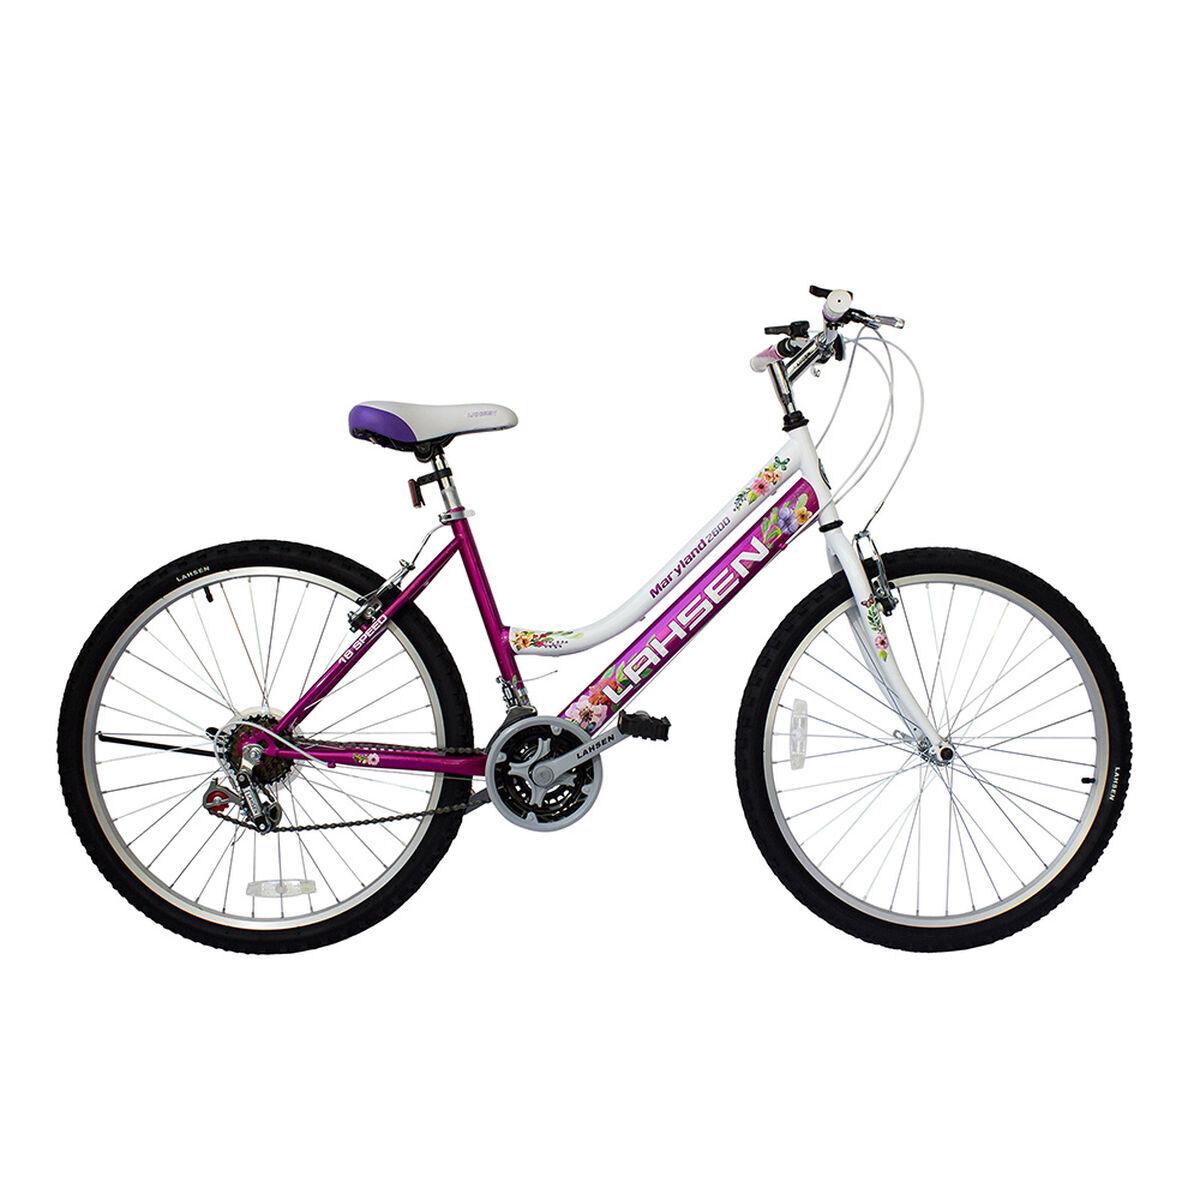 Bicicleta Lahsen BO82601 MaryLand Aro 26